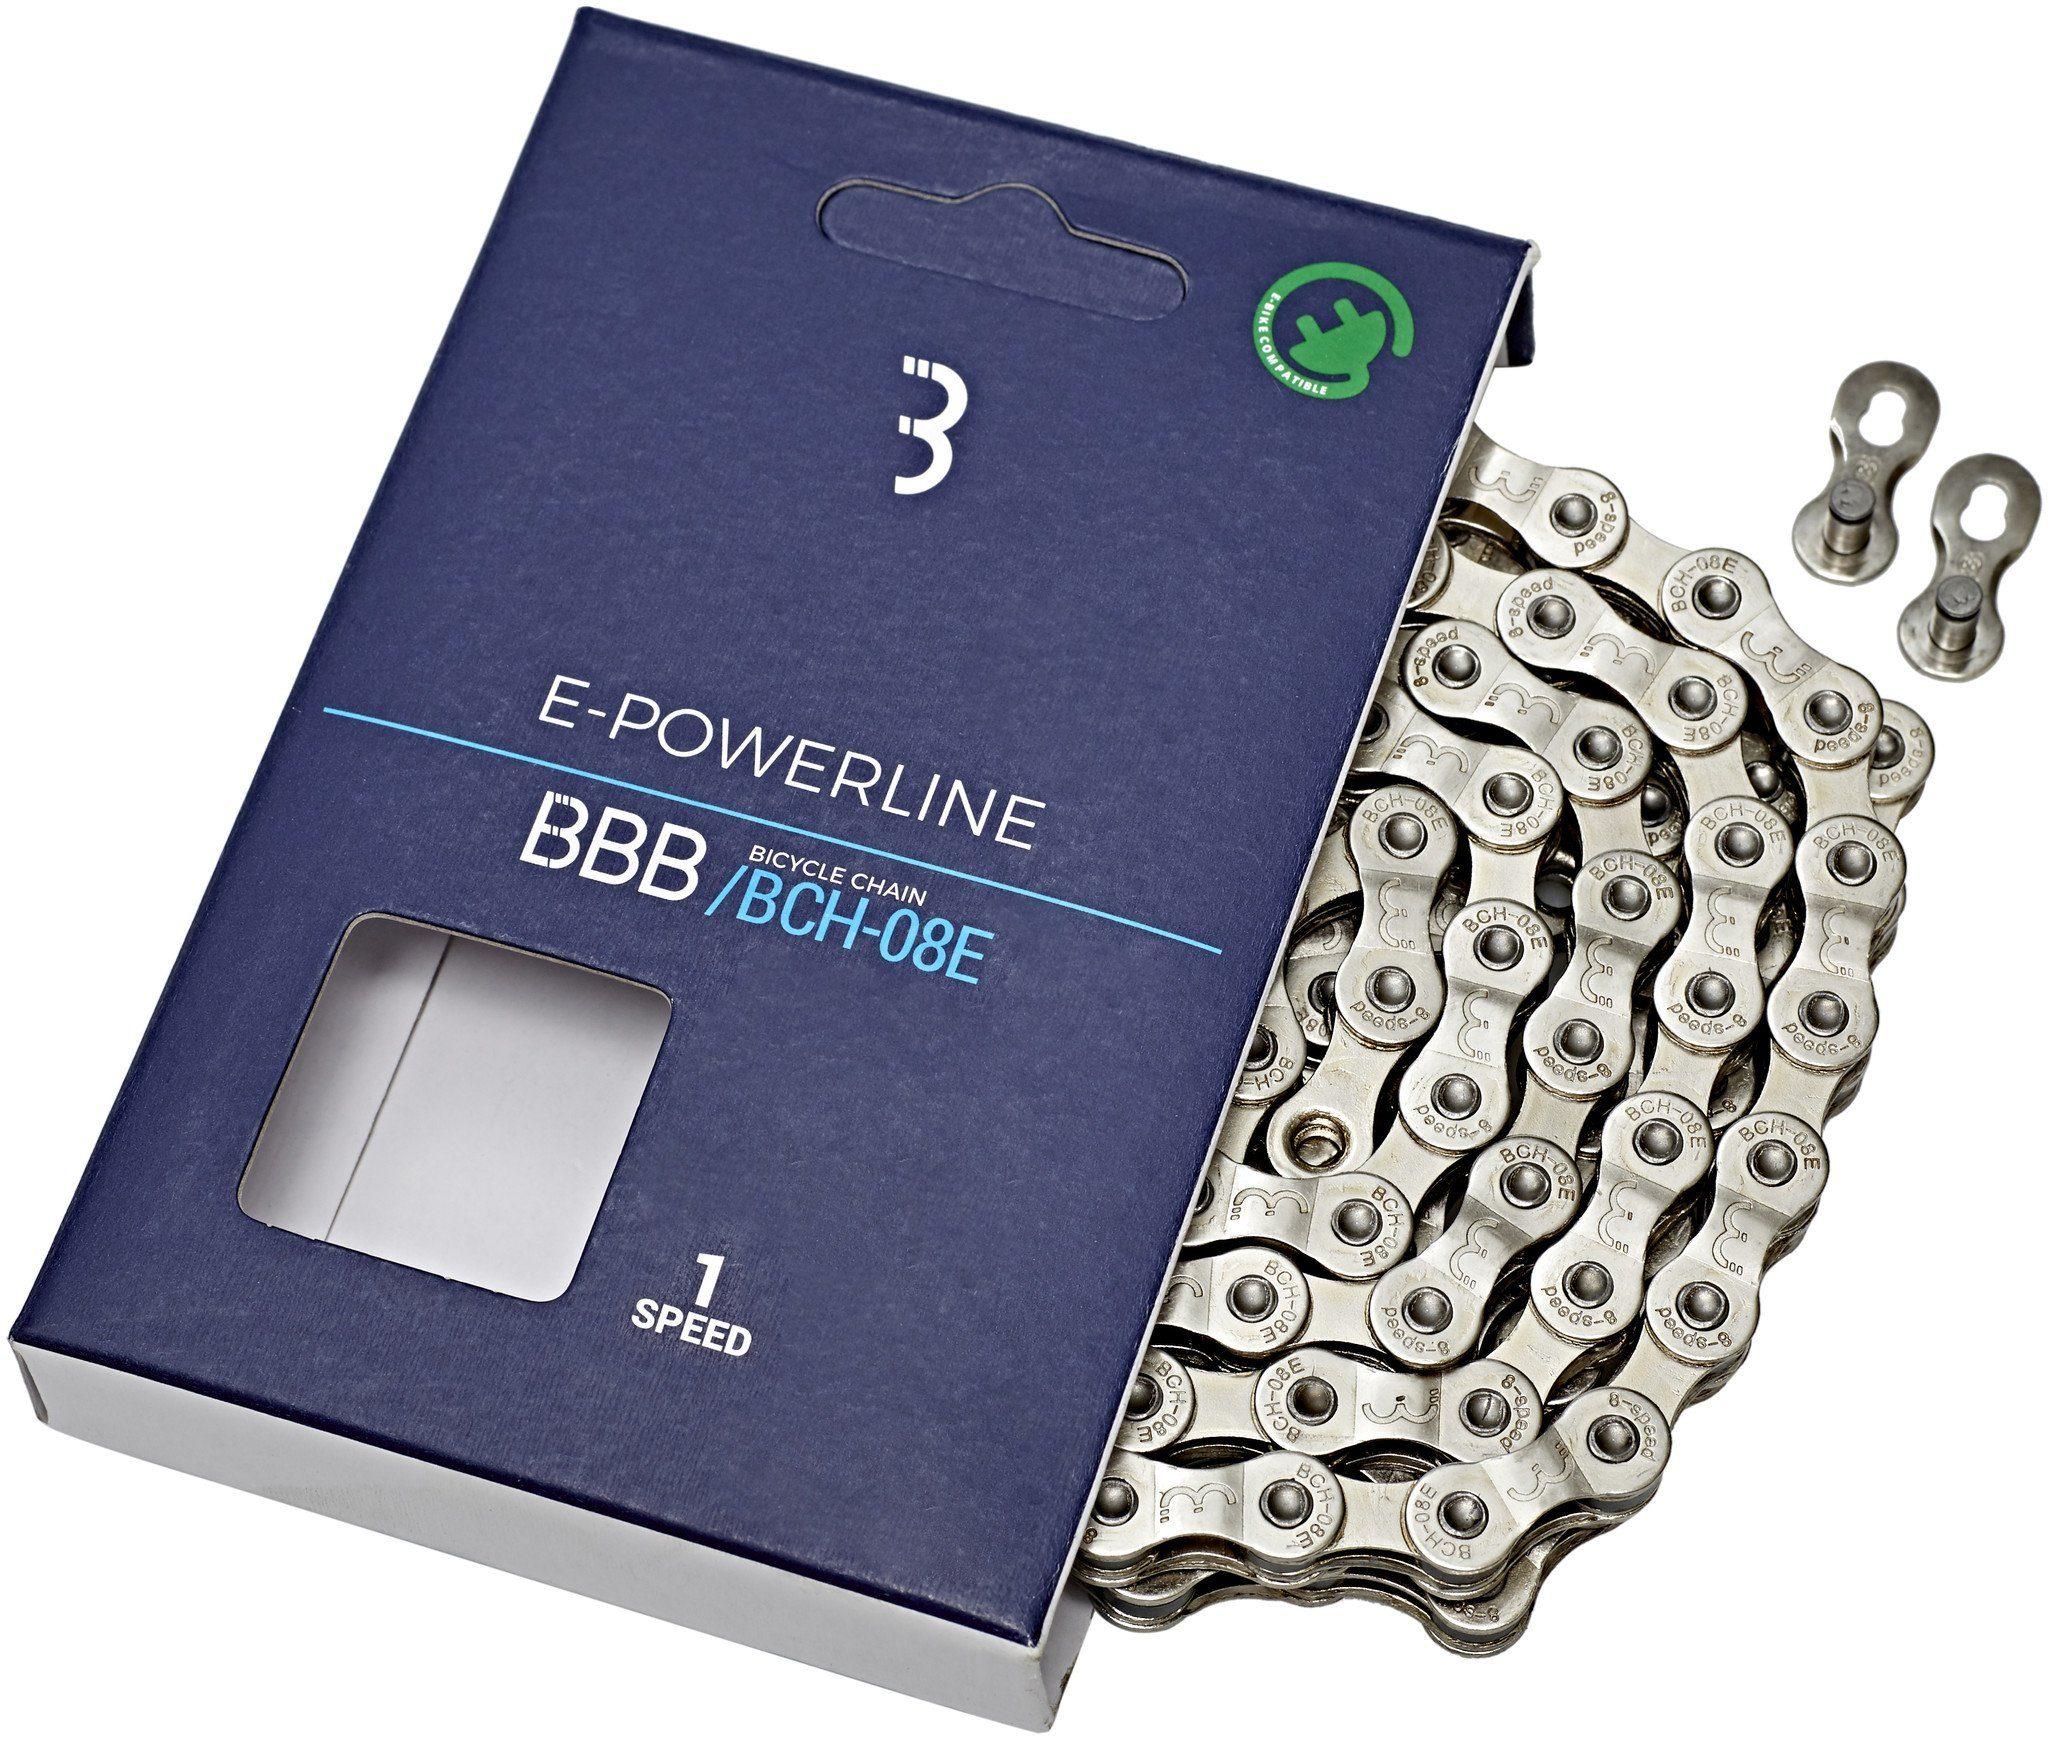 BBB Ketten »E-Powerline E-Bike BCH-01E Kette Singlespeed«